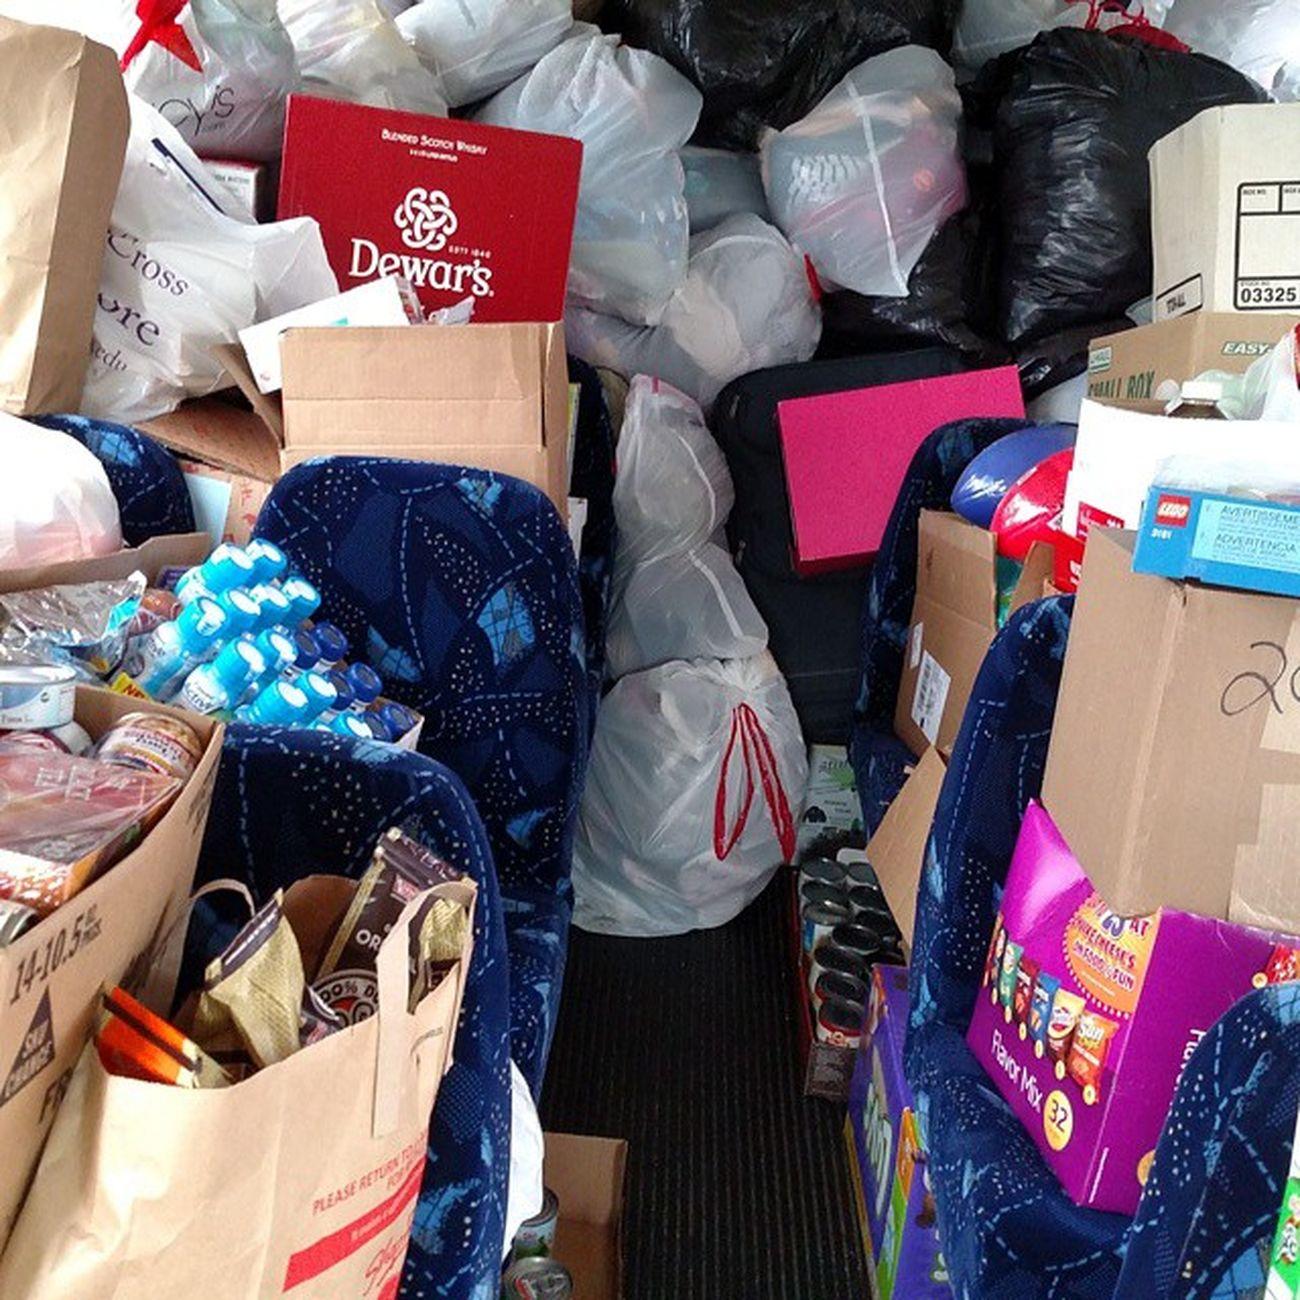 Stuff-A-Shuttle Charity Homeless Clothes Cannedgoods